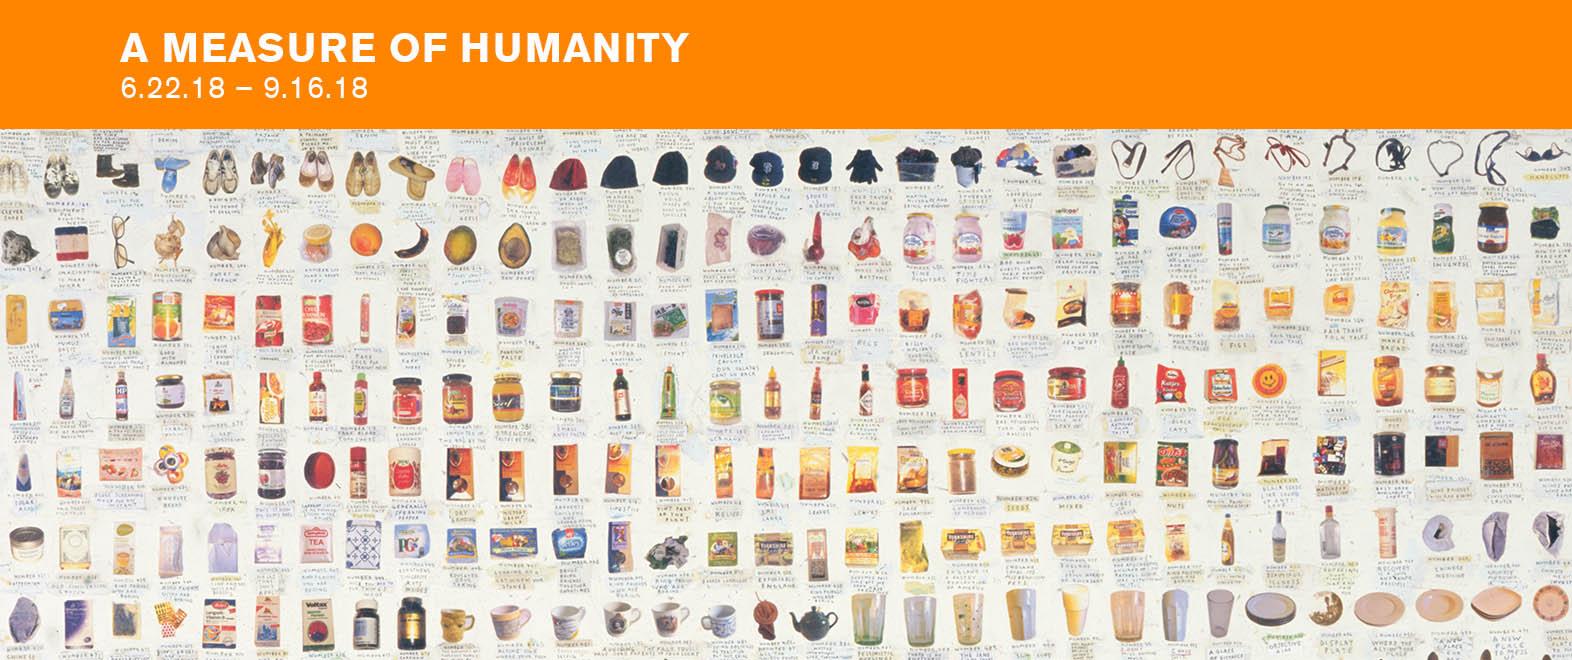 Measure of Humanity